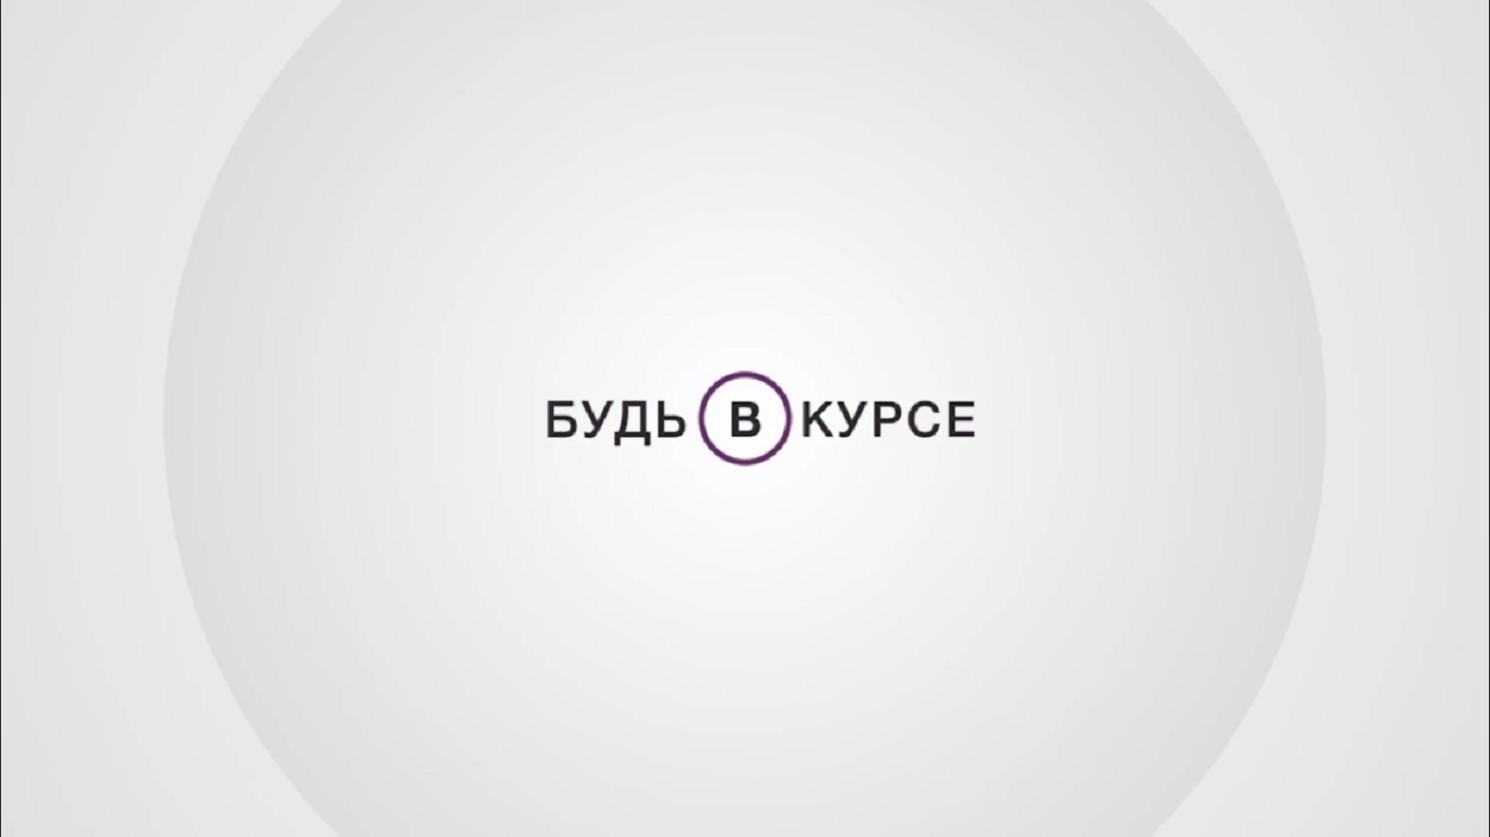 bud1-1250x703-1-3